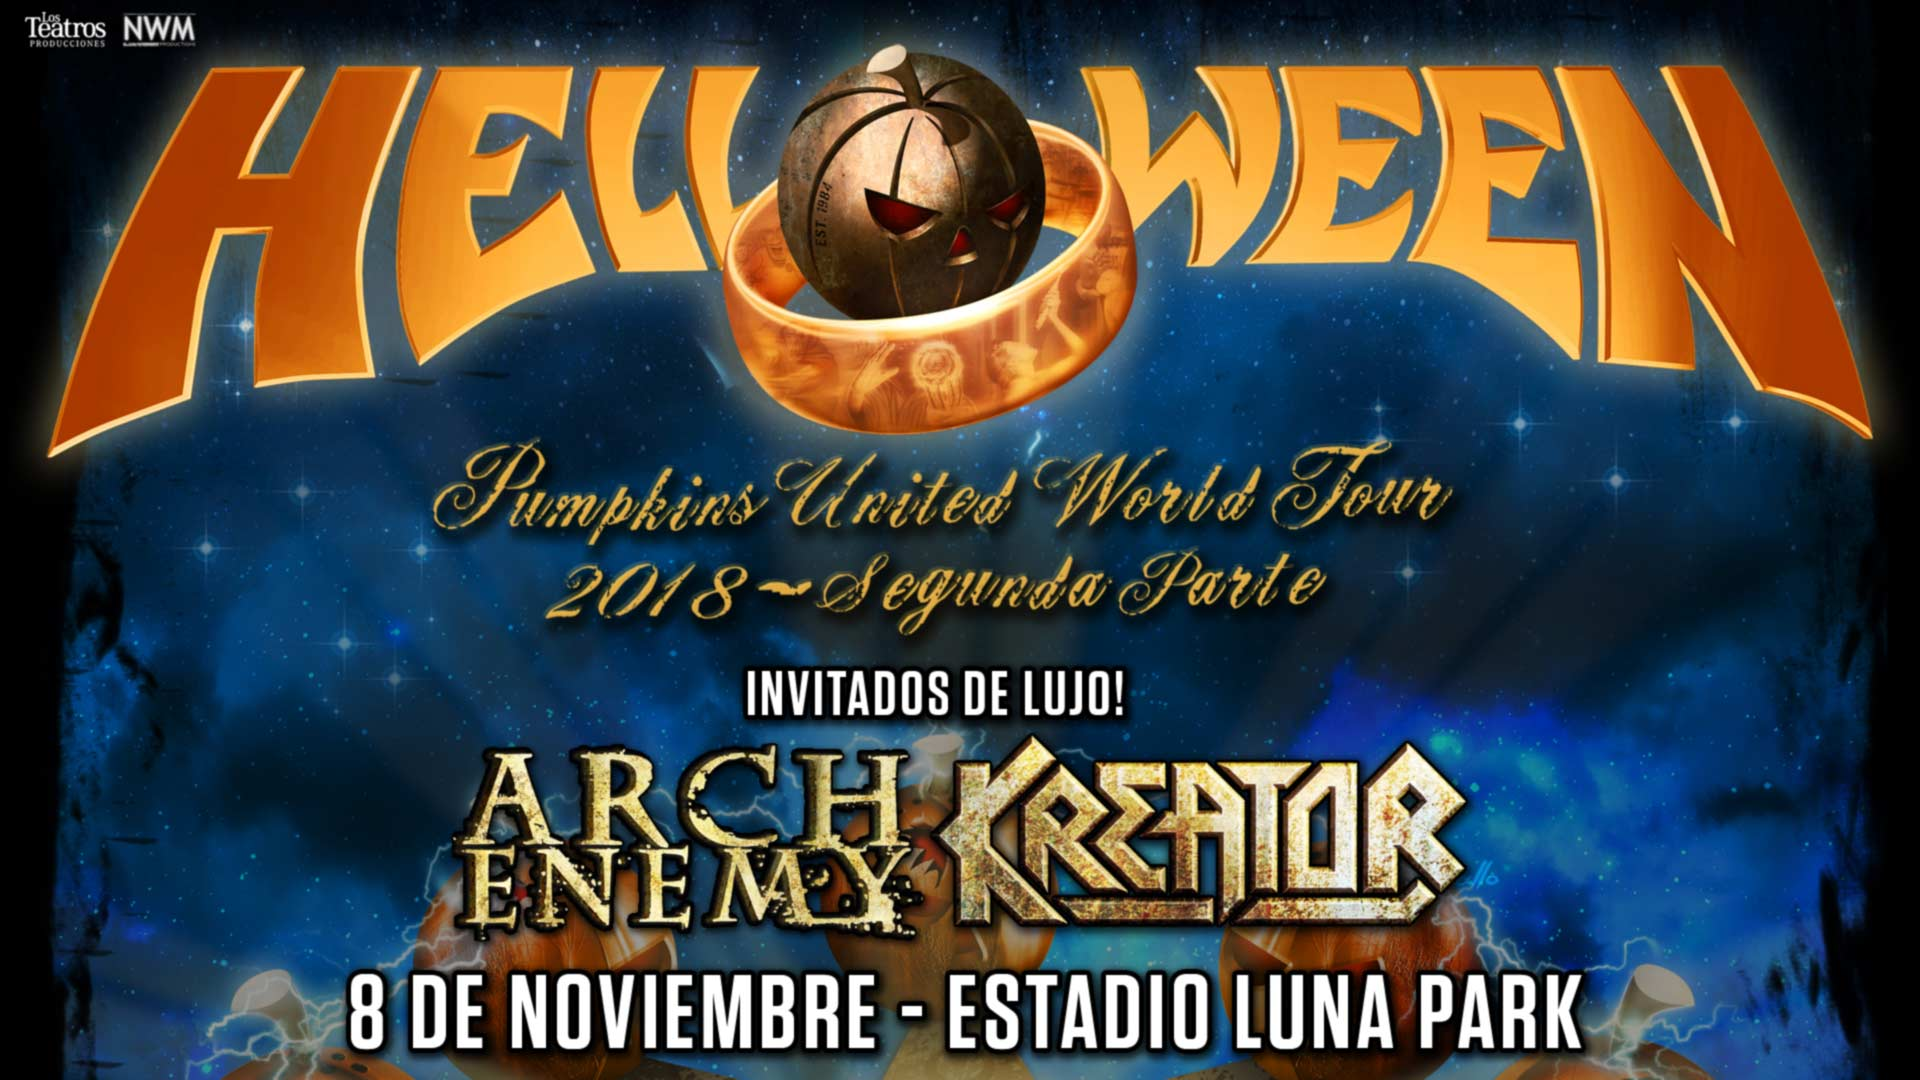 Helloween Arch Enemy Kreator Stadium Luna Park